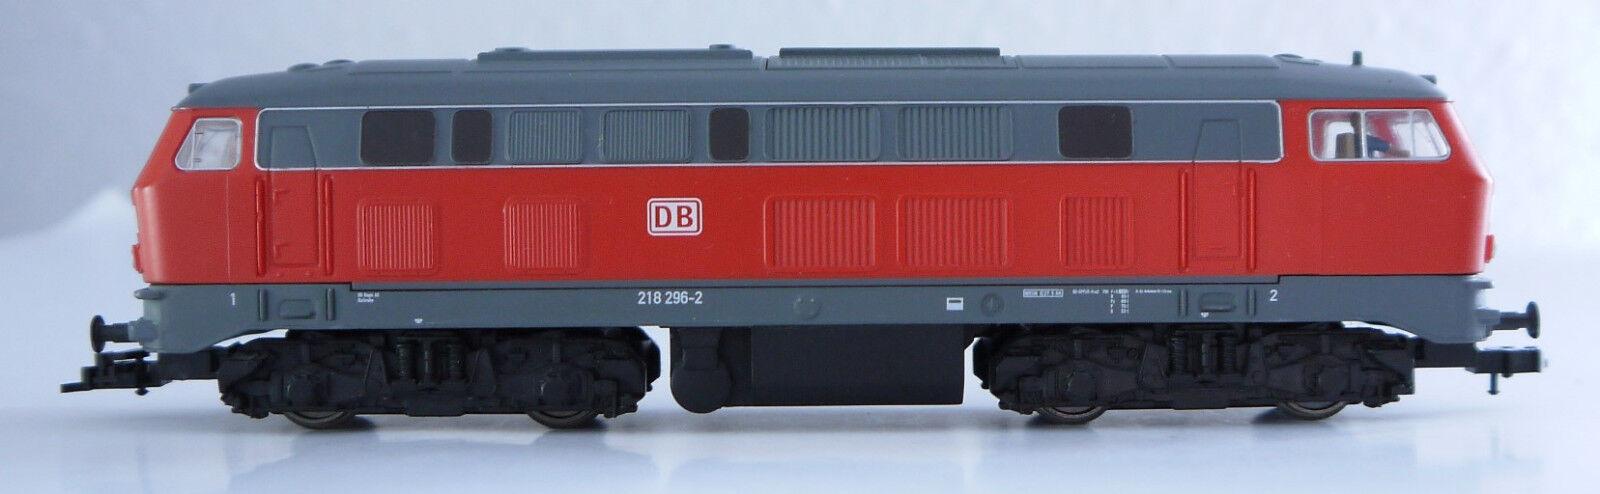 PIKO DB 52500 diesel locomotora BR 218 296-2 - pista HO